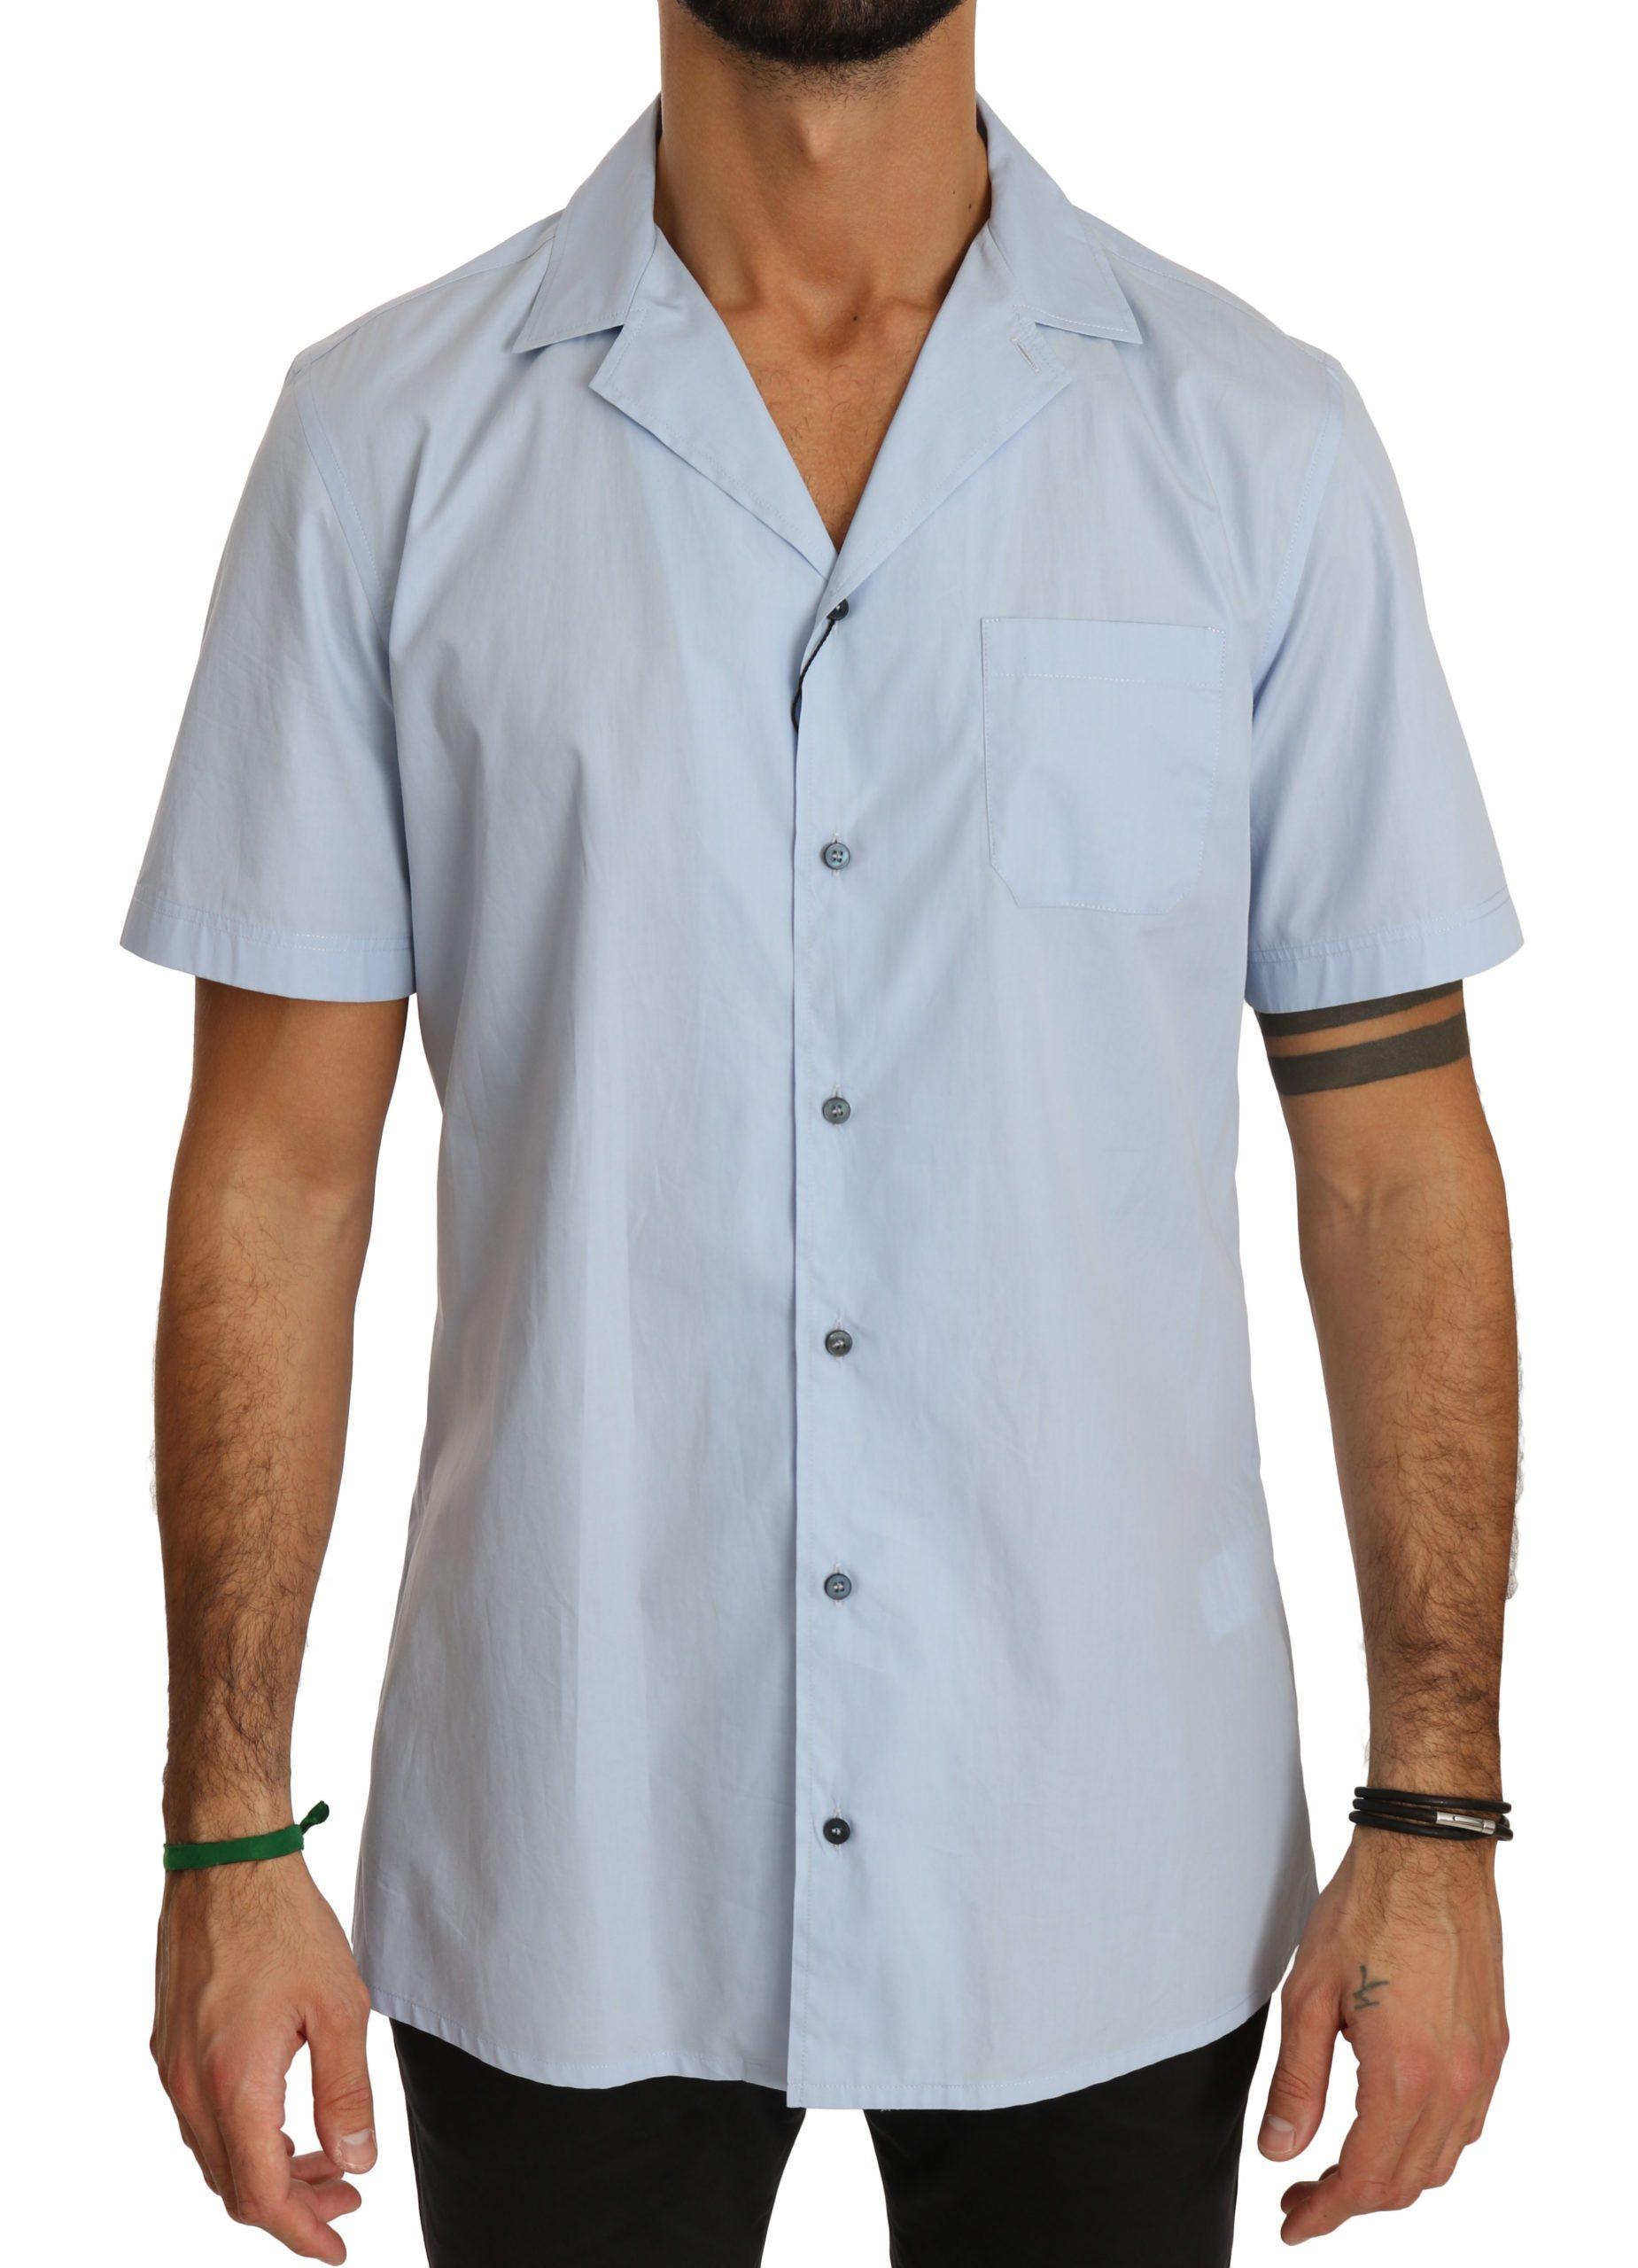 Blue Short Sleeve 100% Cotton Top Shirt - IT40 | M